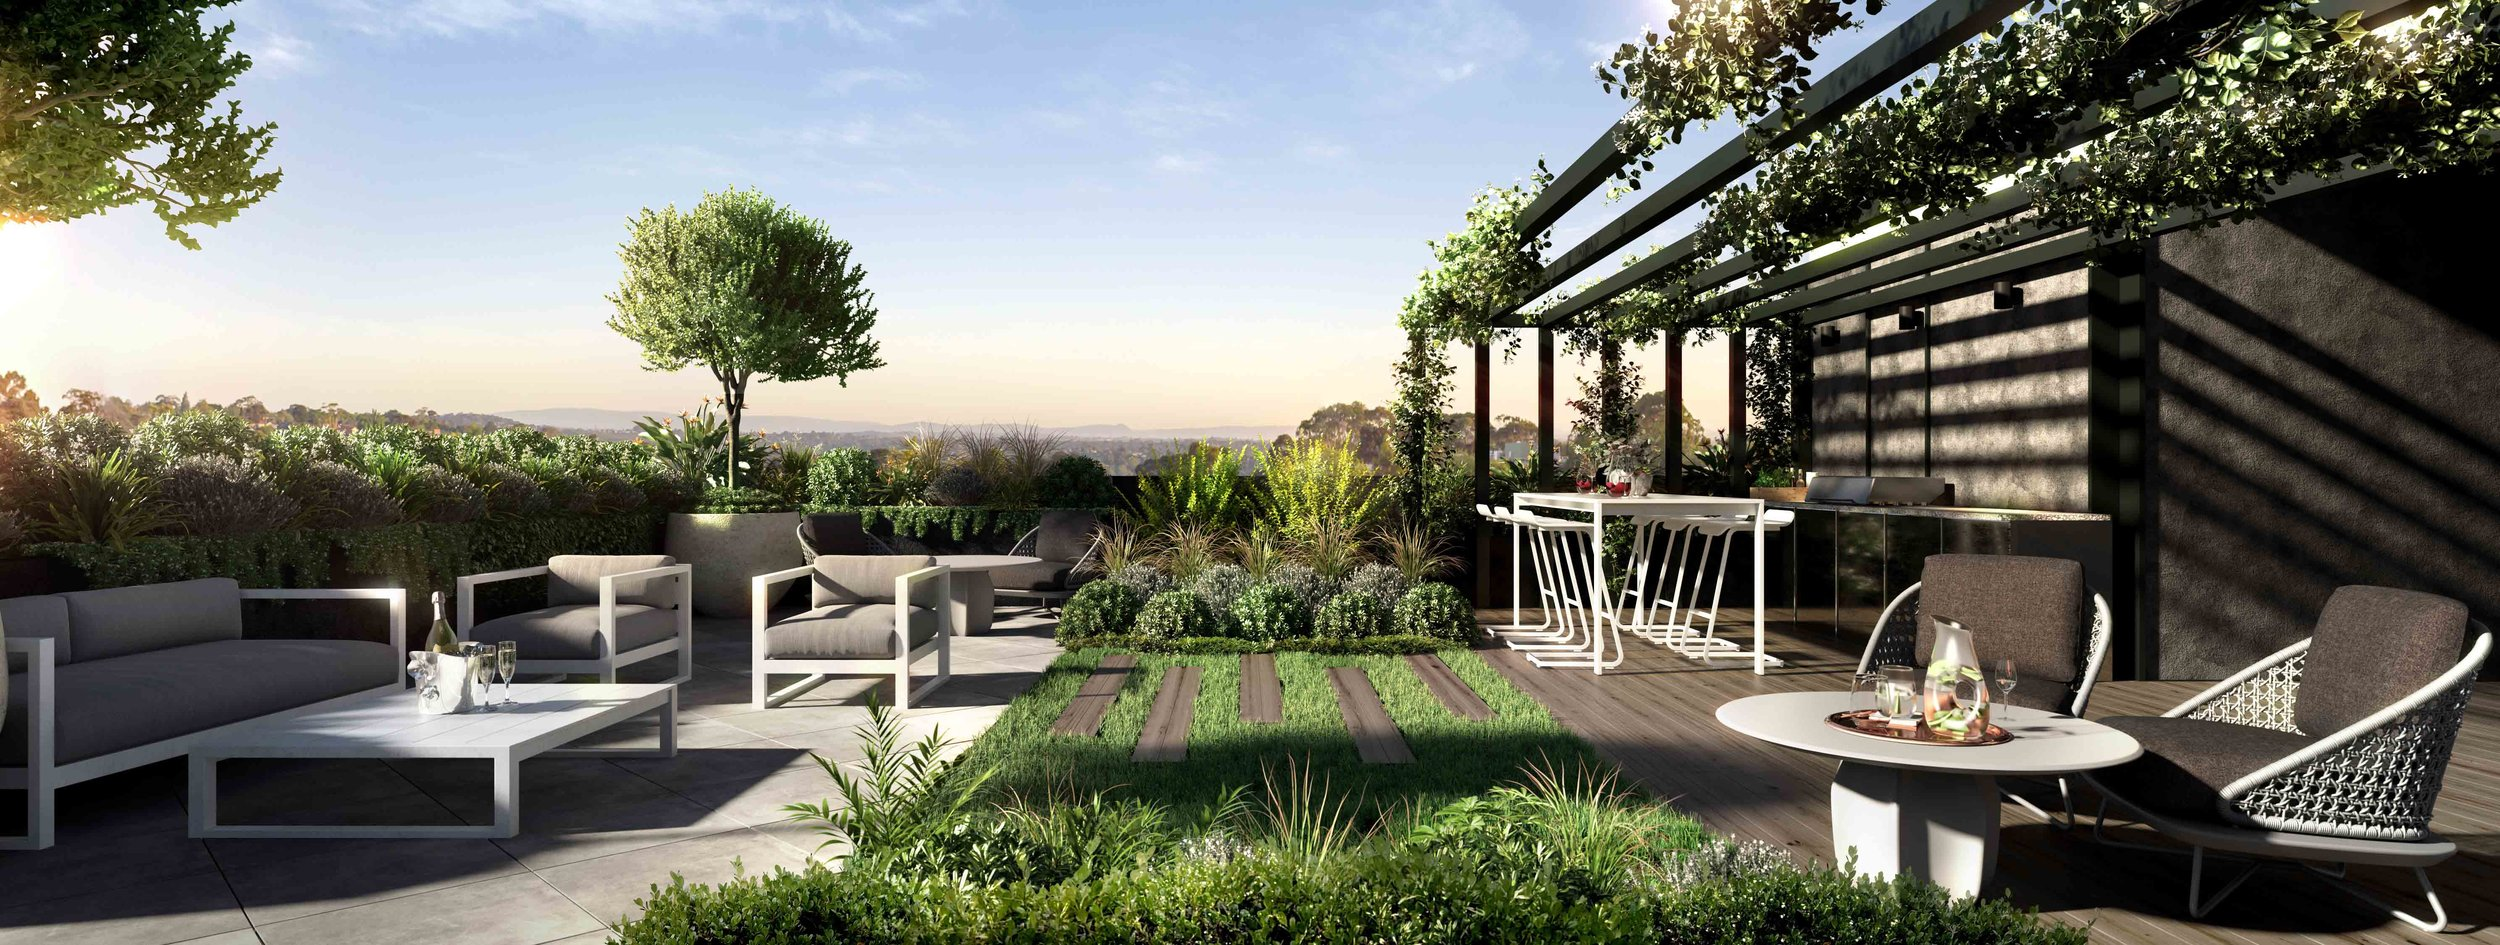 M&P_Amenity_Rooftop Gardenresize.jpg